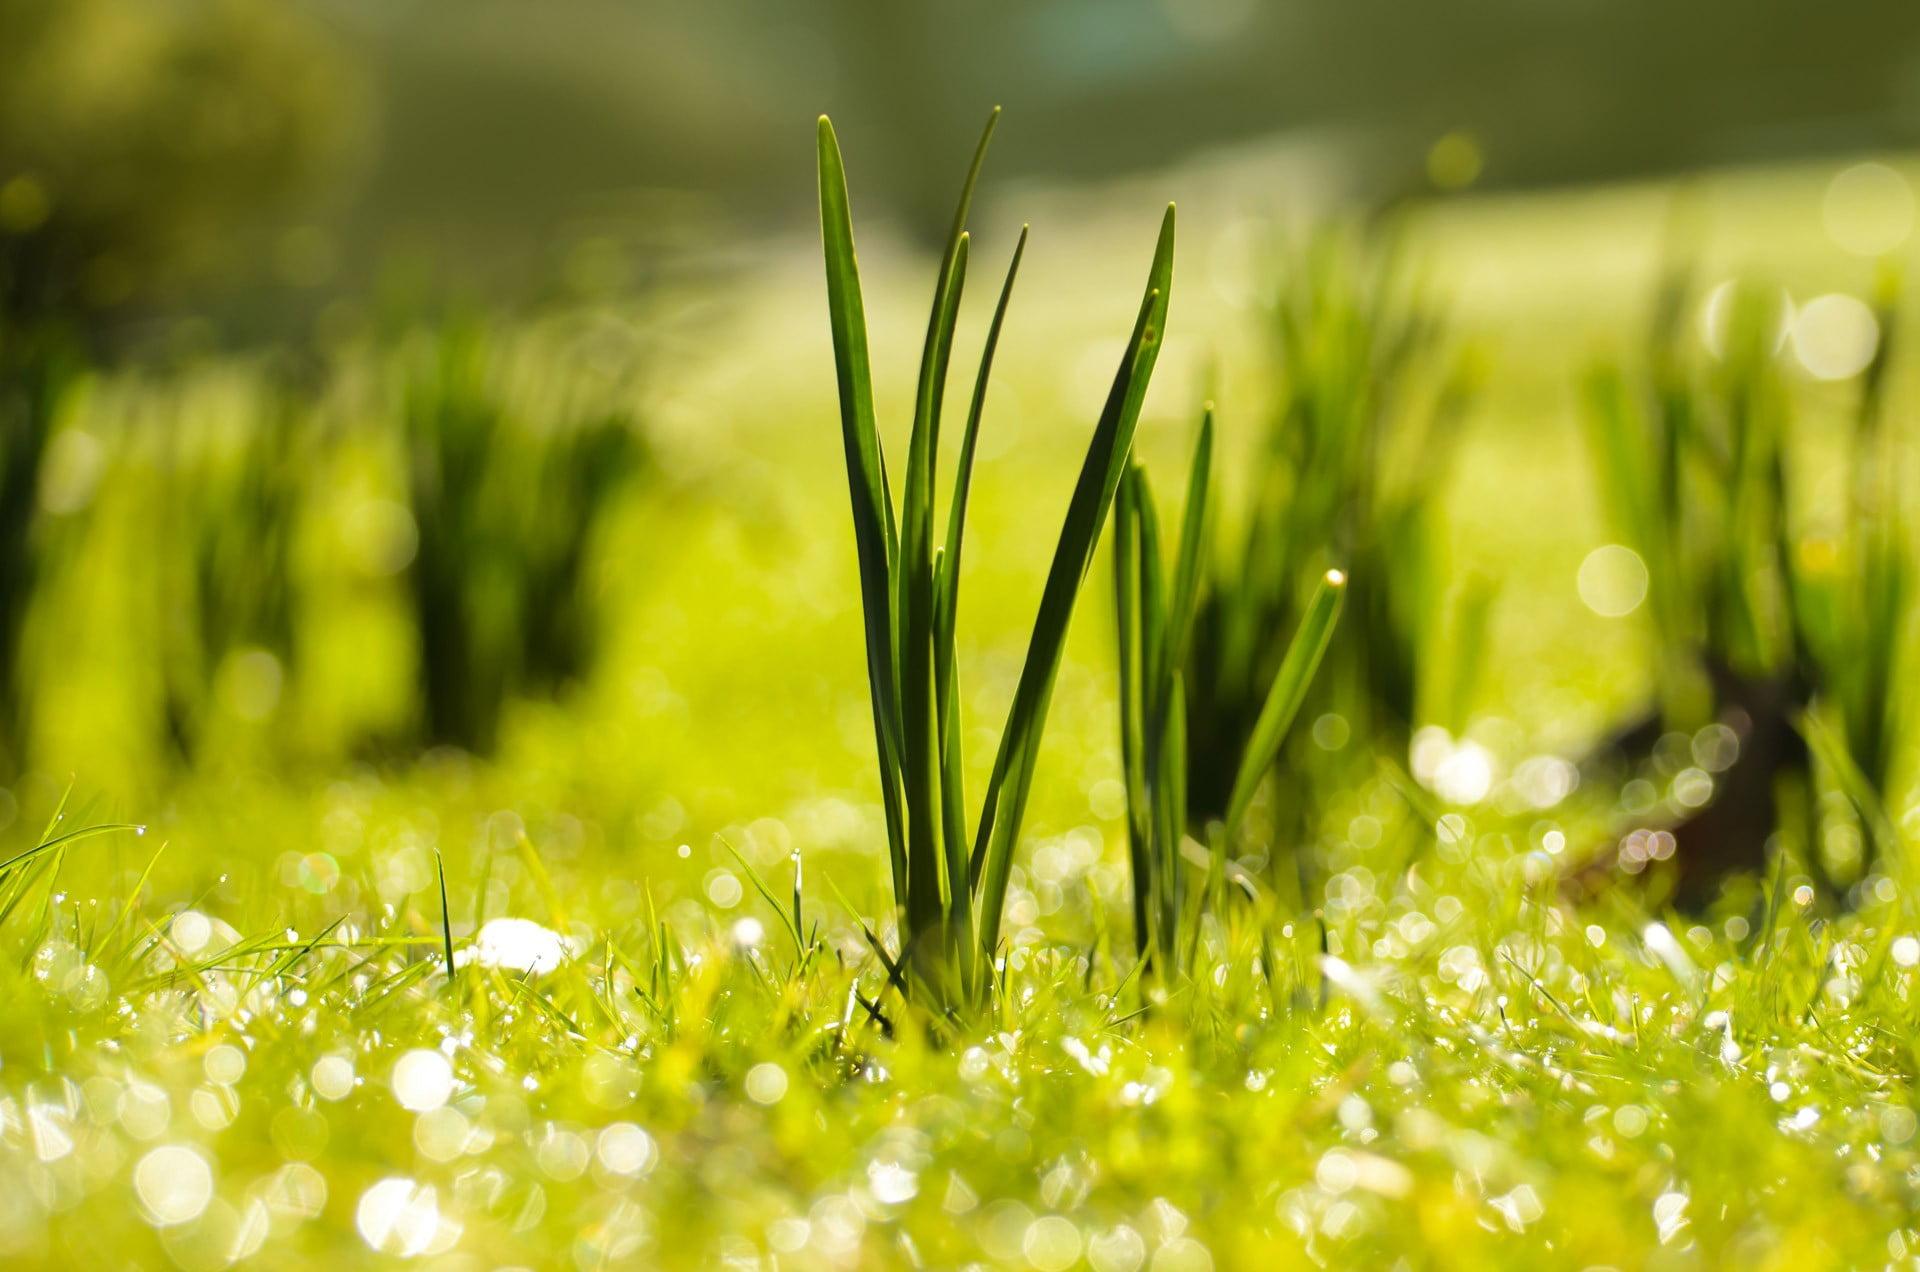 Back Lawn grass